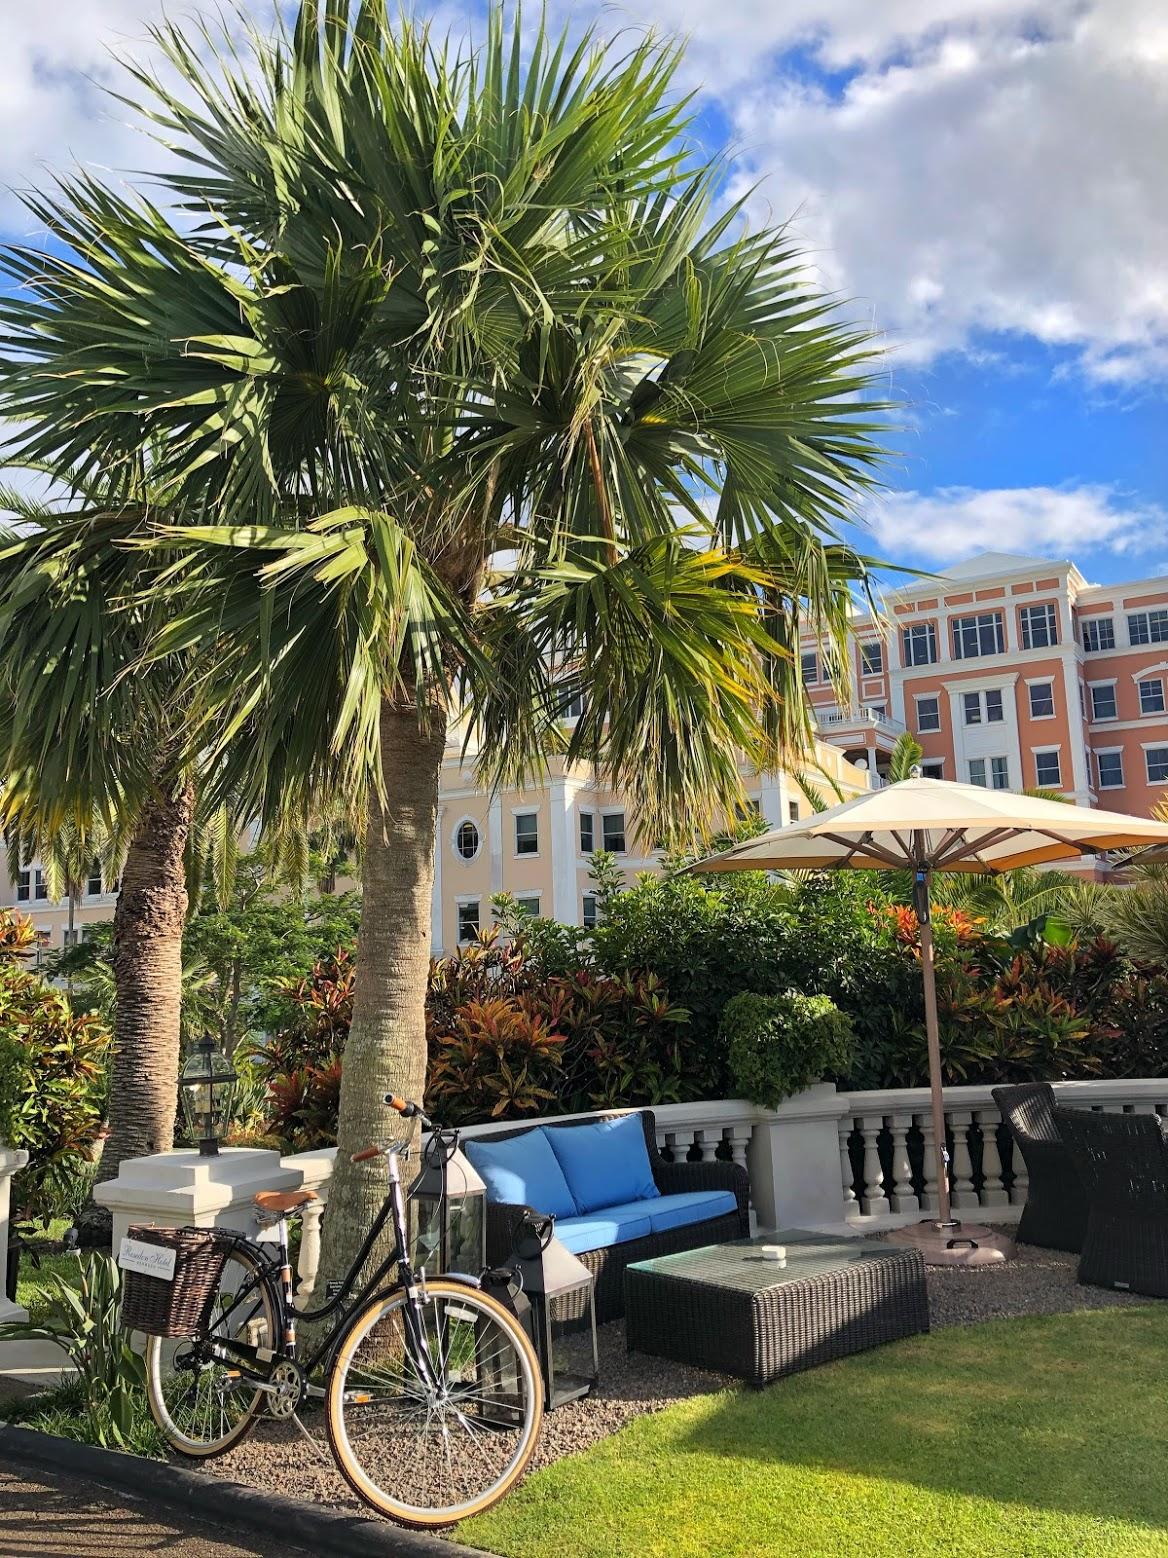 rosedon hotel, bermuda, the-alyst.com